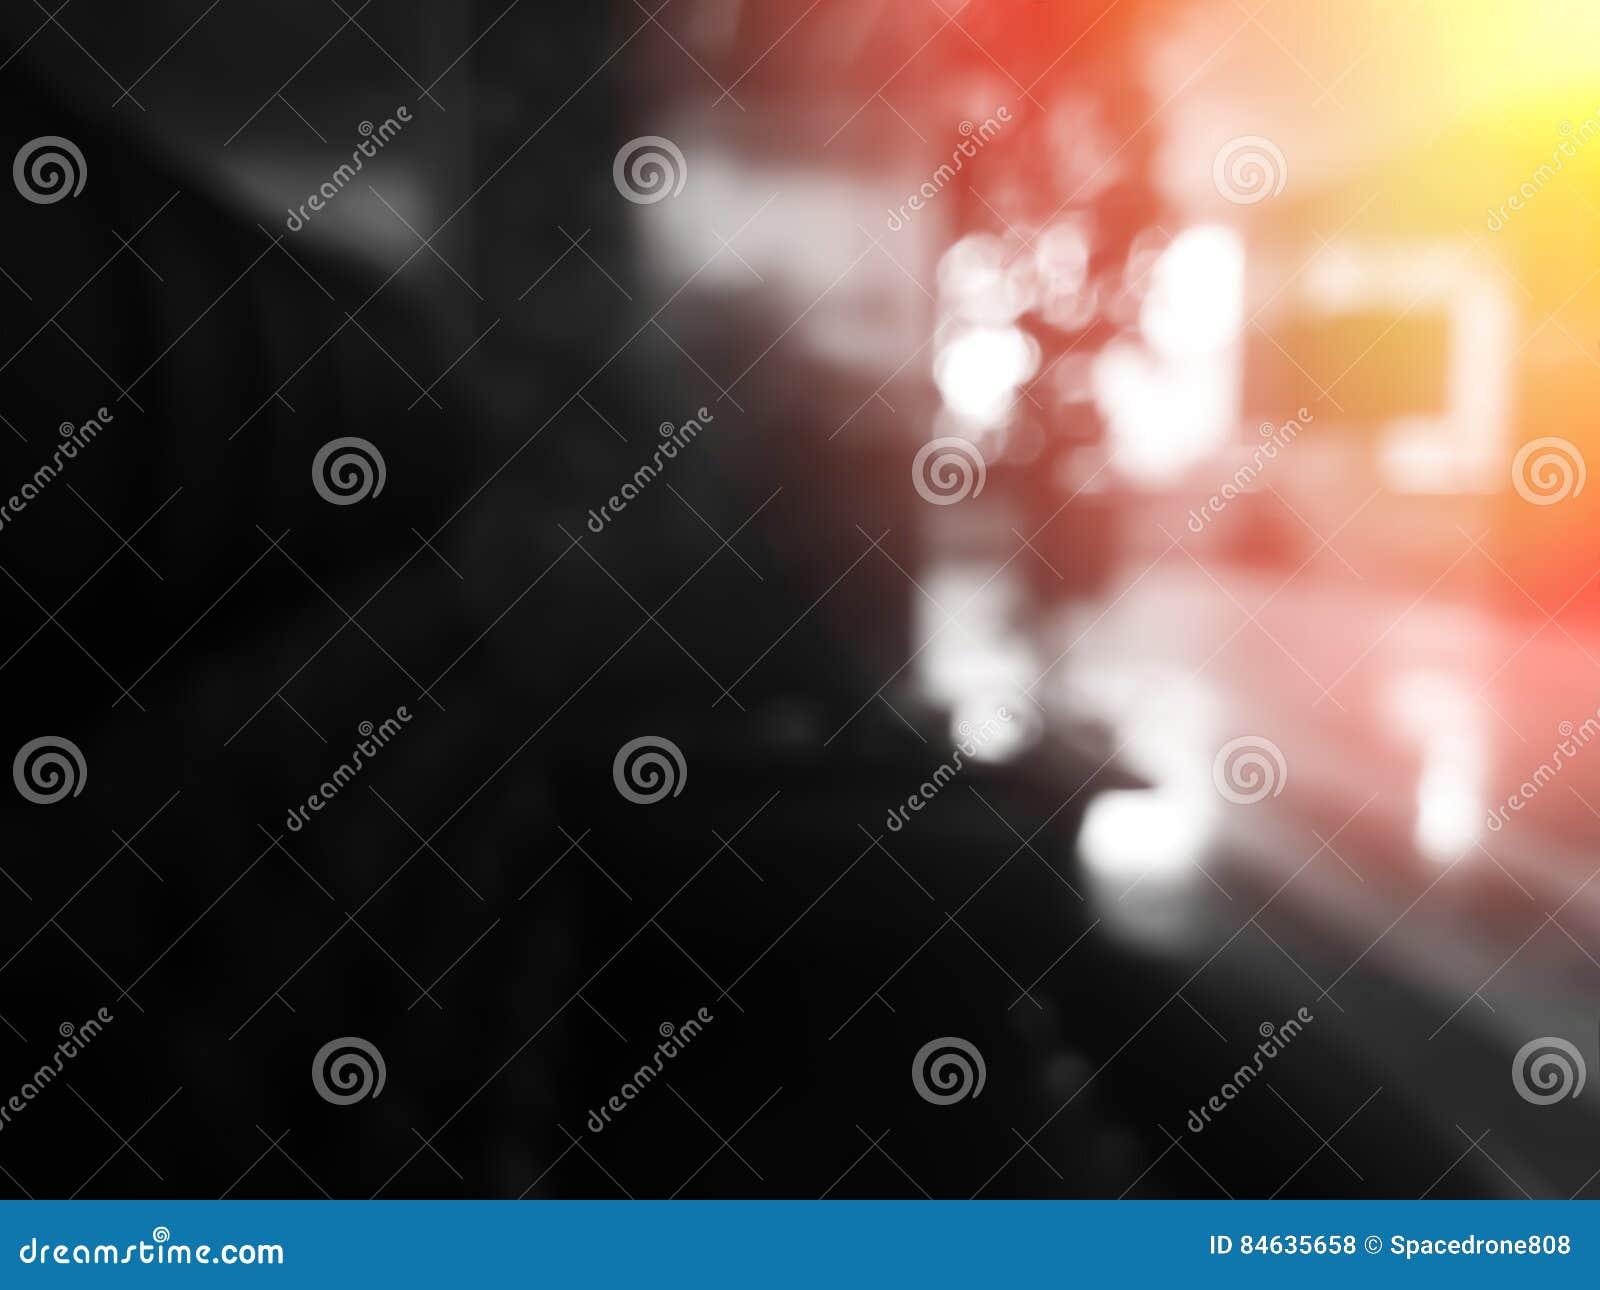 Unduh 54+ Background Foto Indoor Hd HD Terbaru